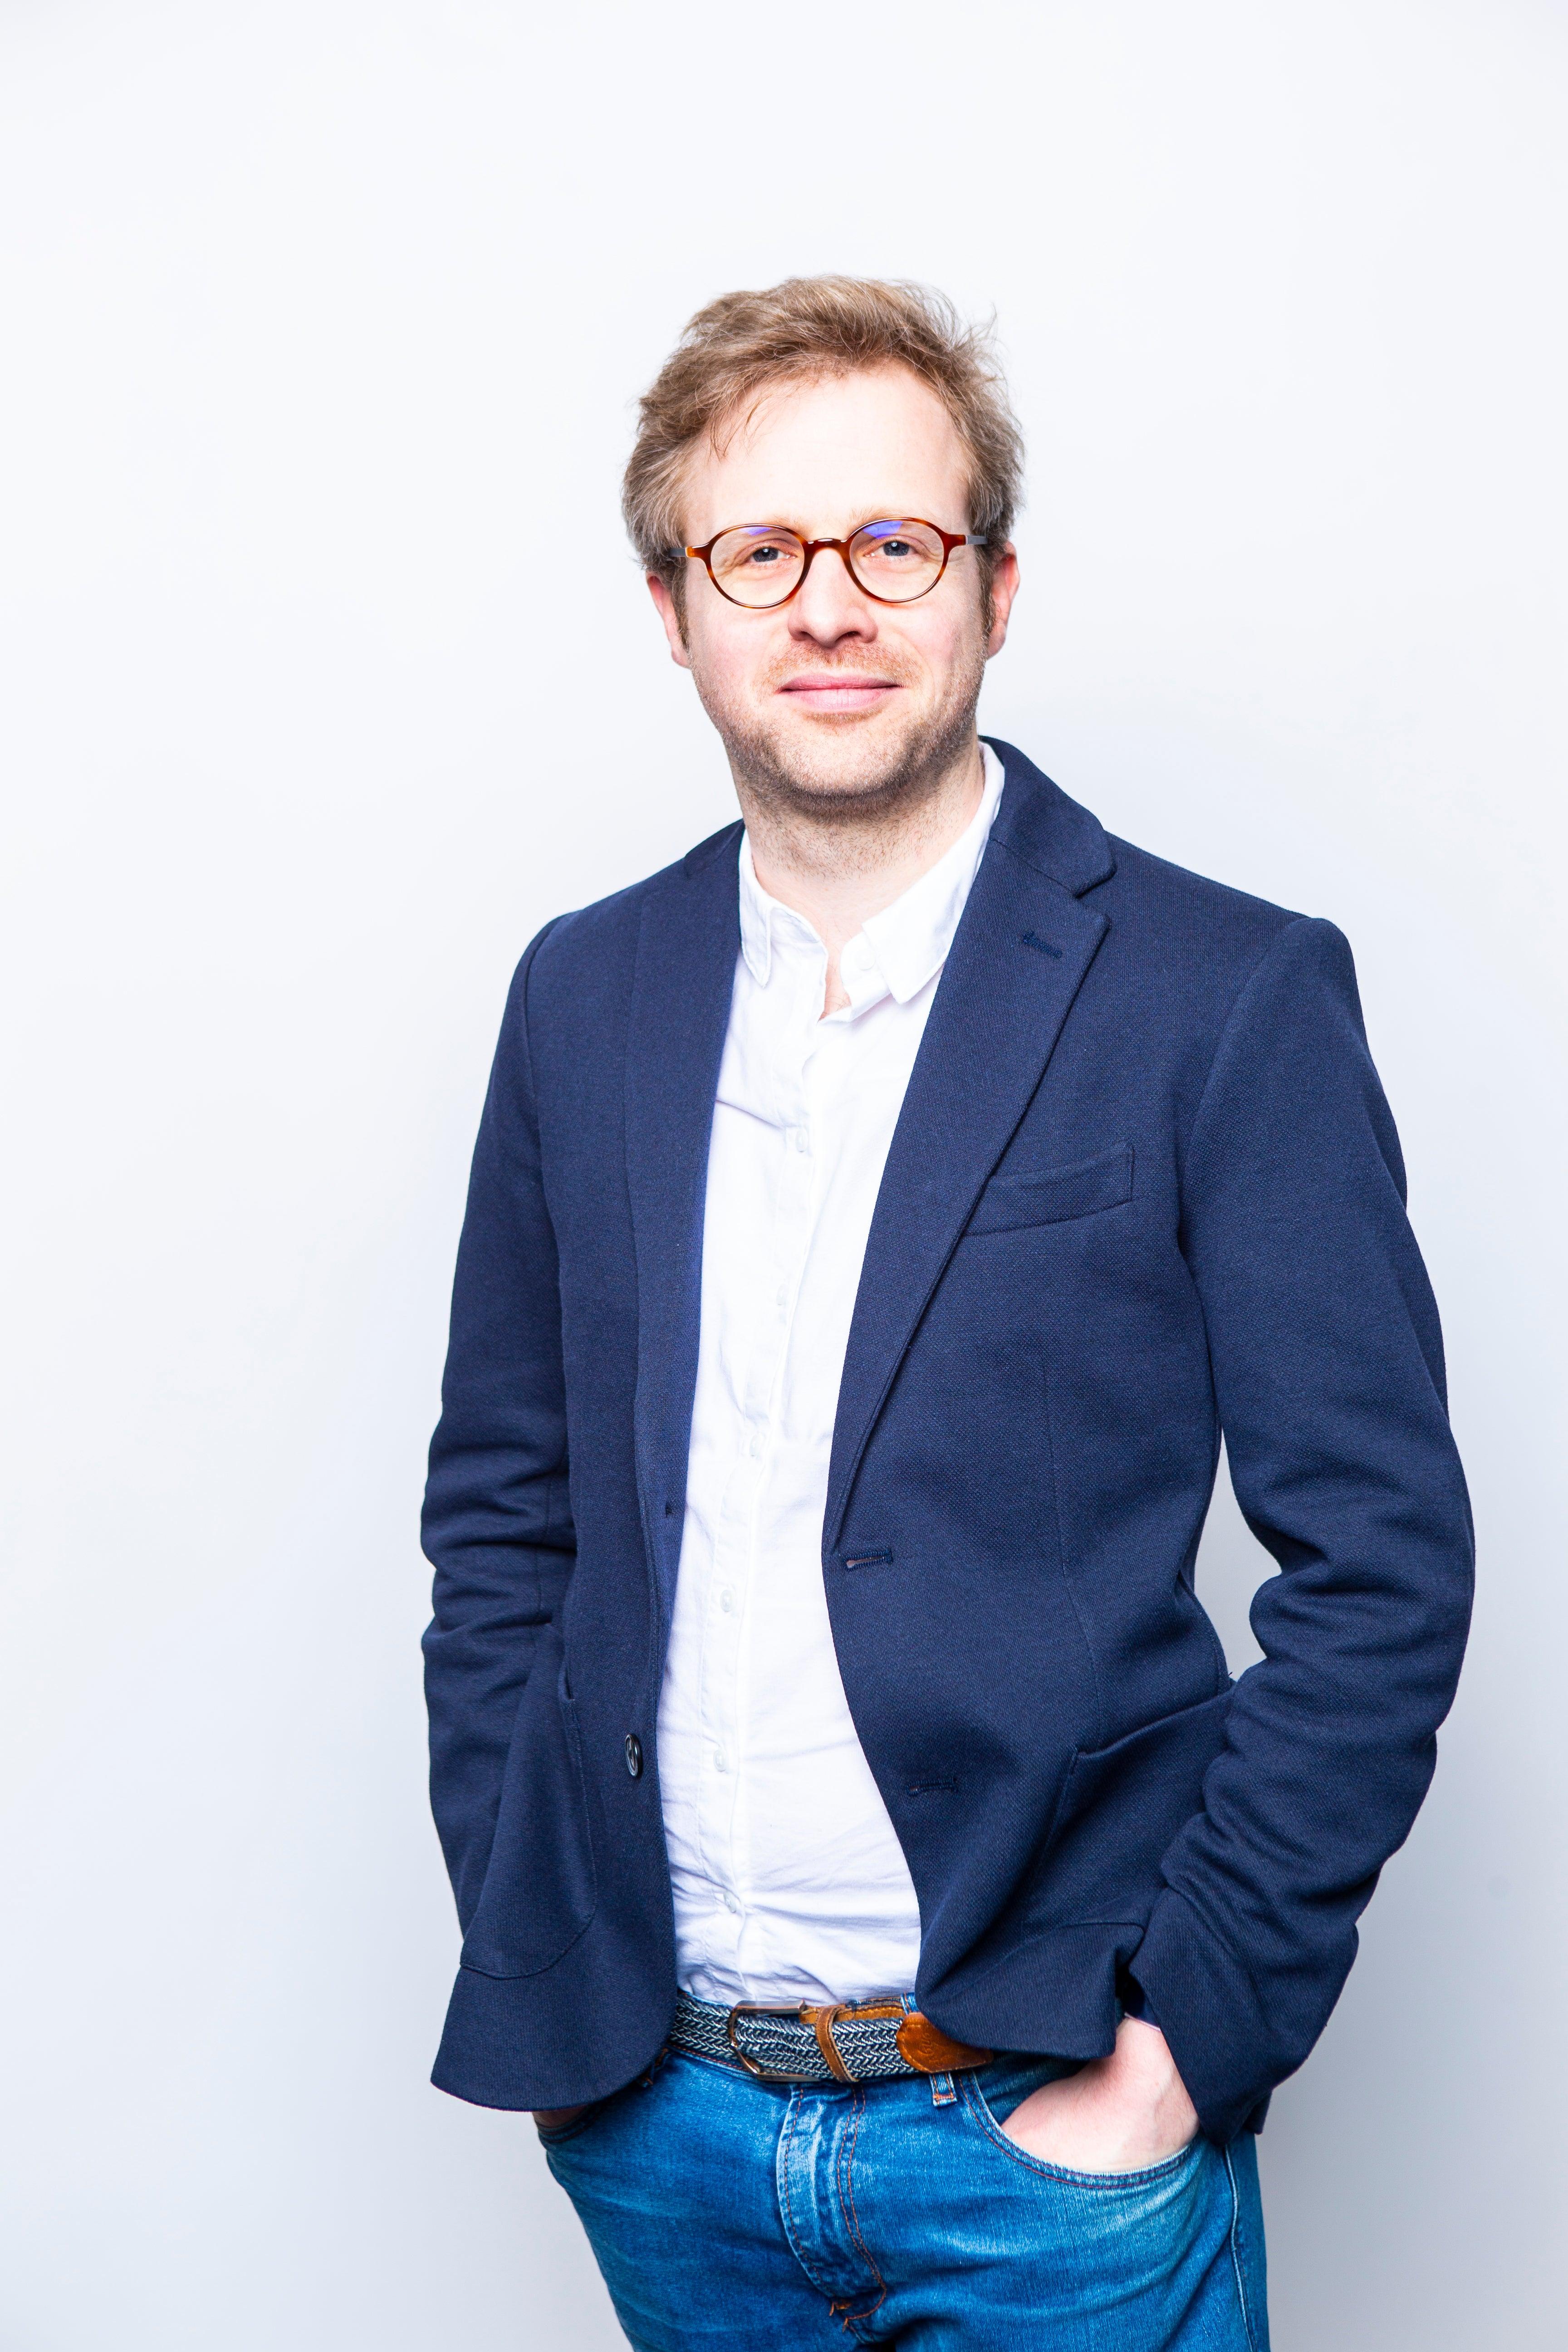 Martin Velge, Head of Dentsu Data Services, Dentsu Aegis Network Belgium